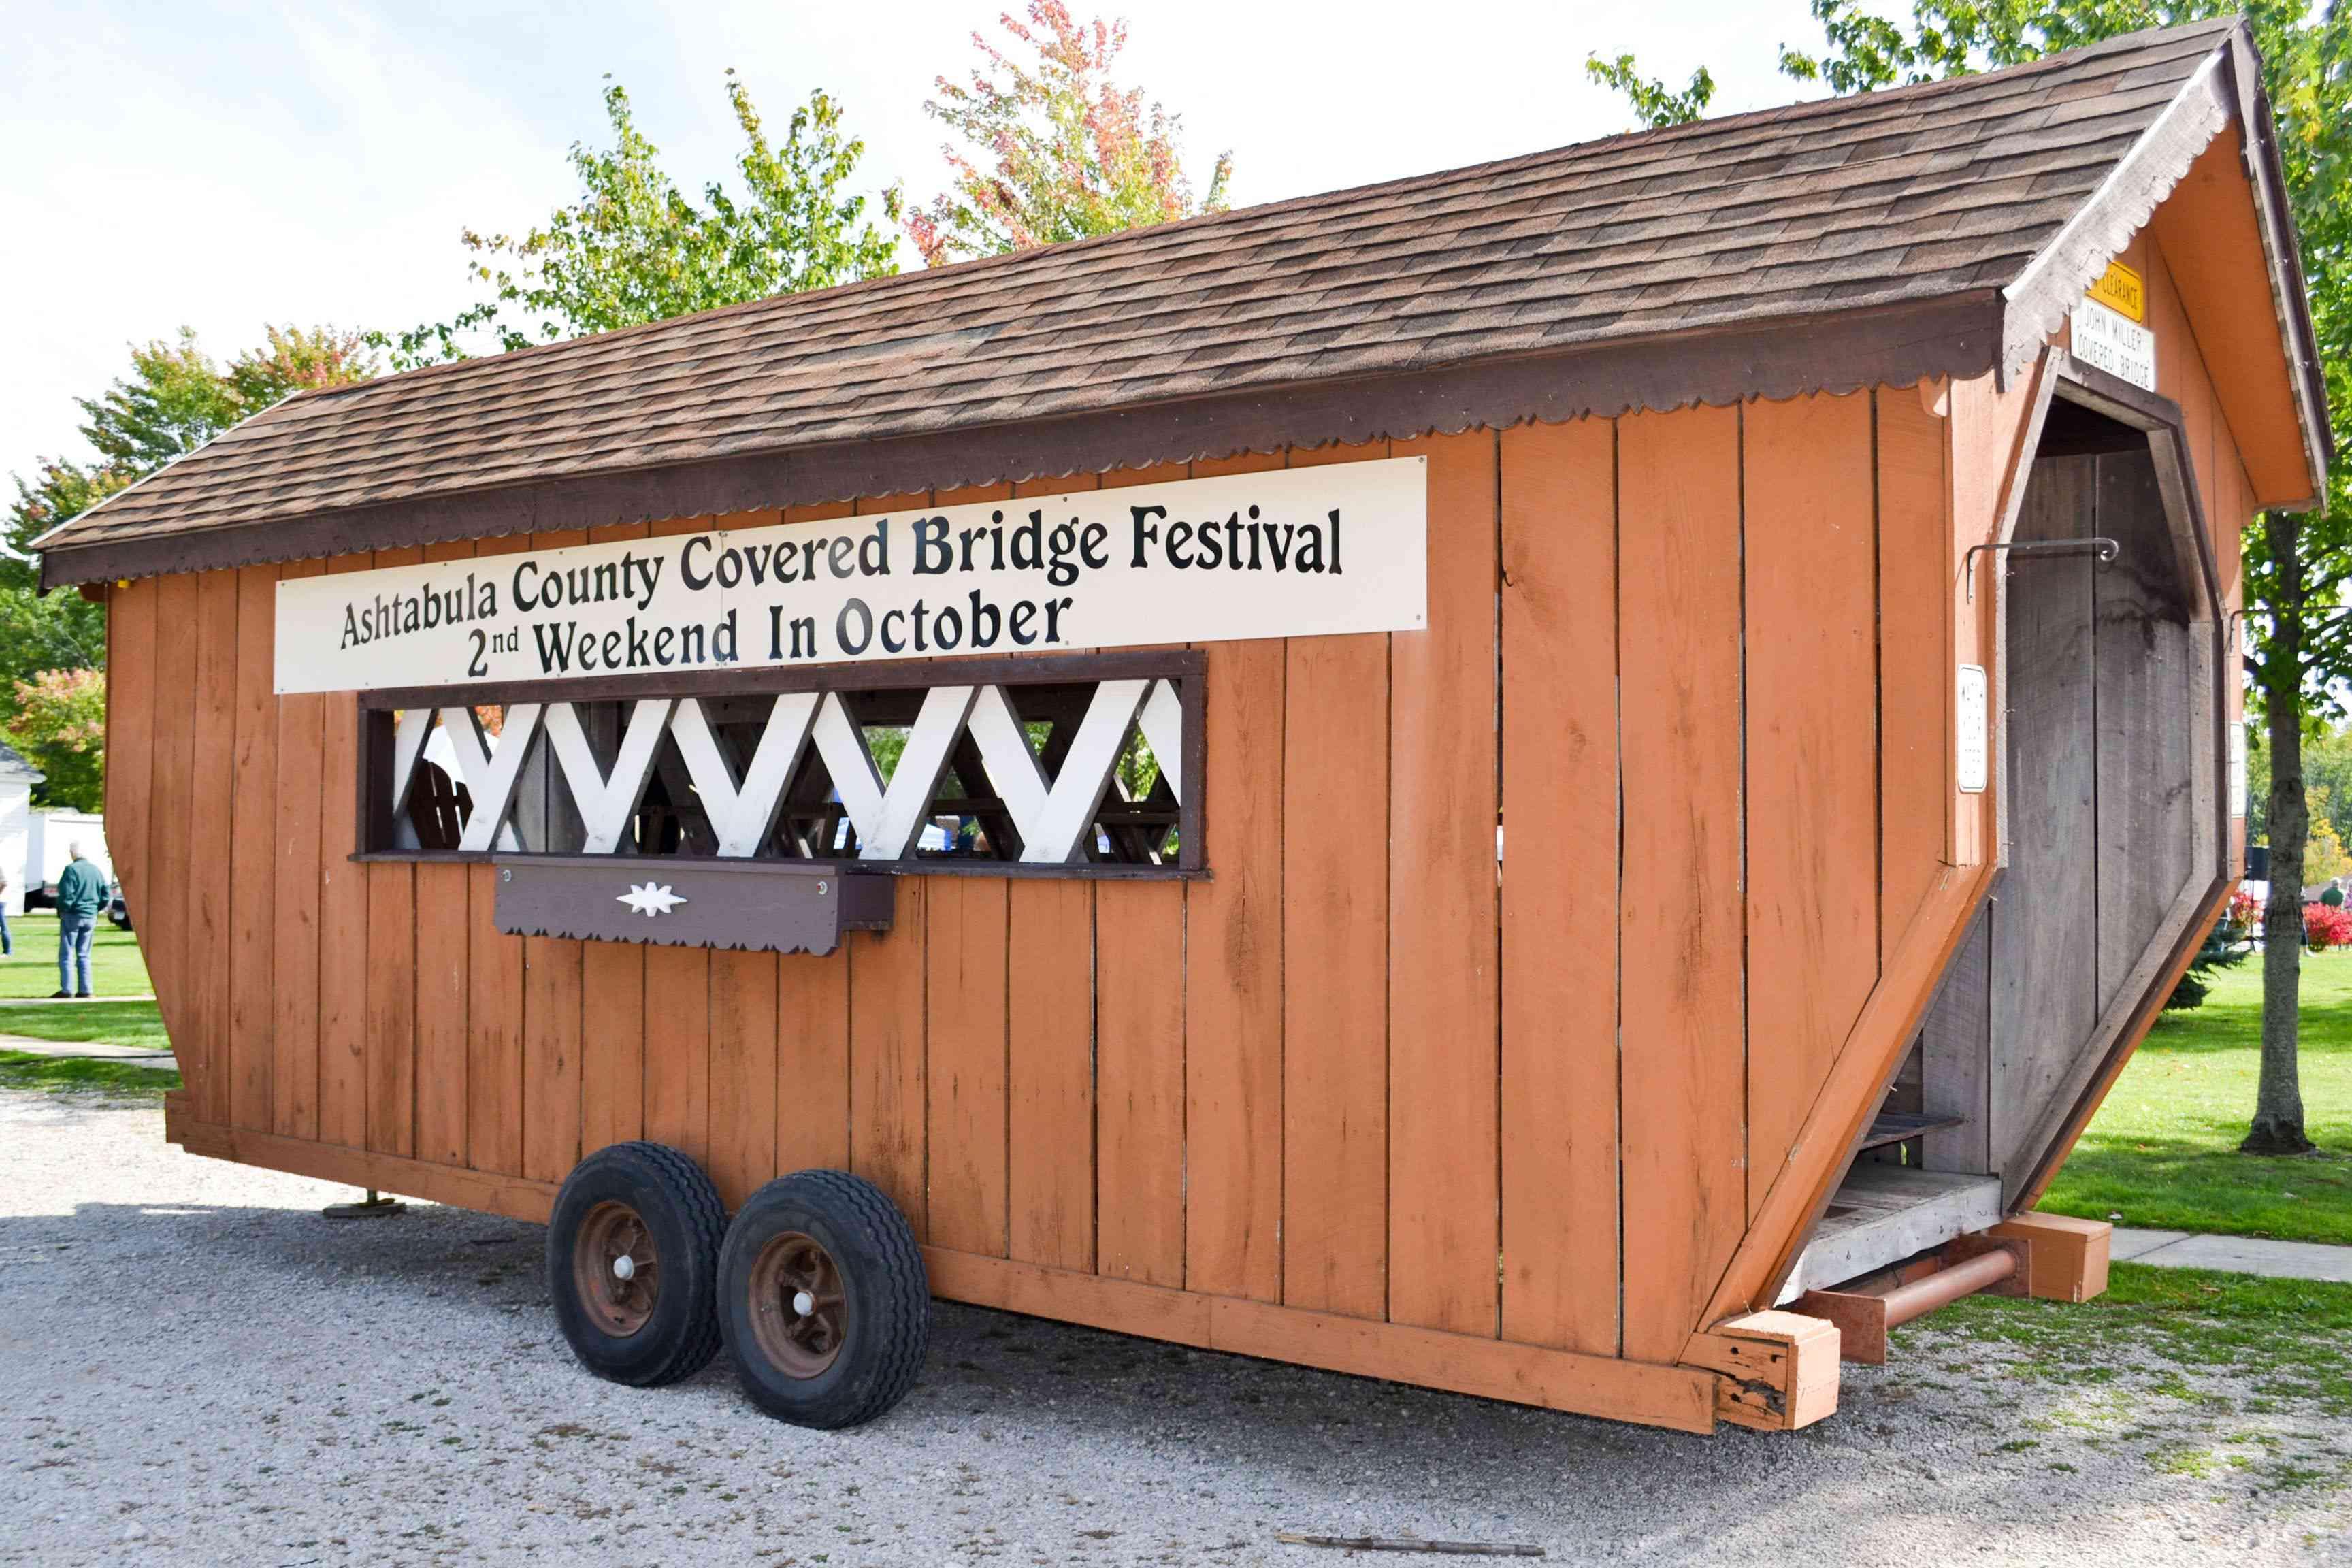 Ashtabula County Covered Bridge Festival